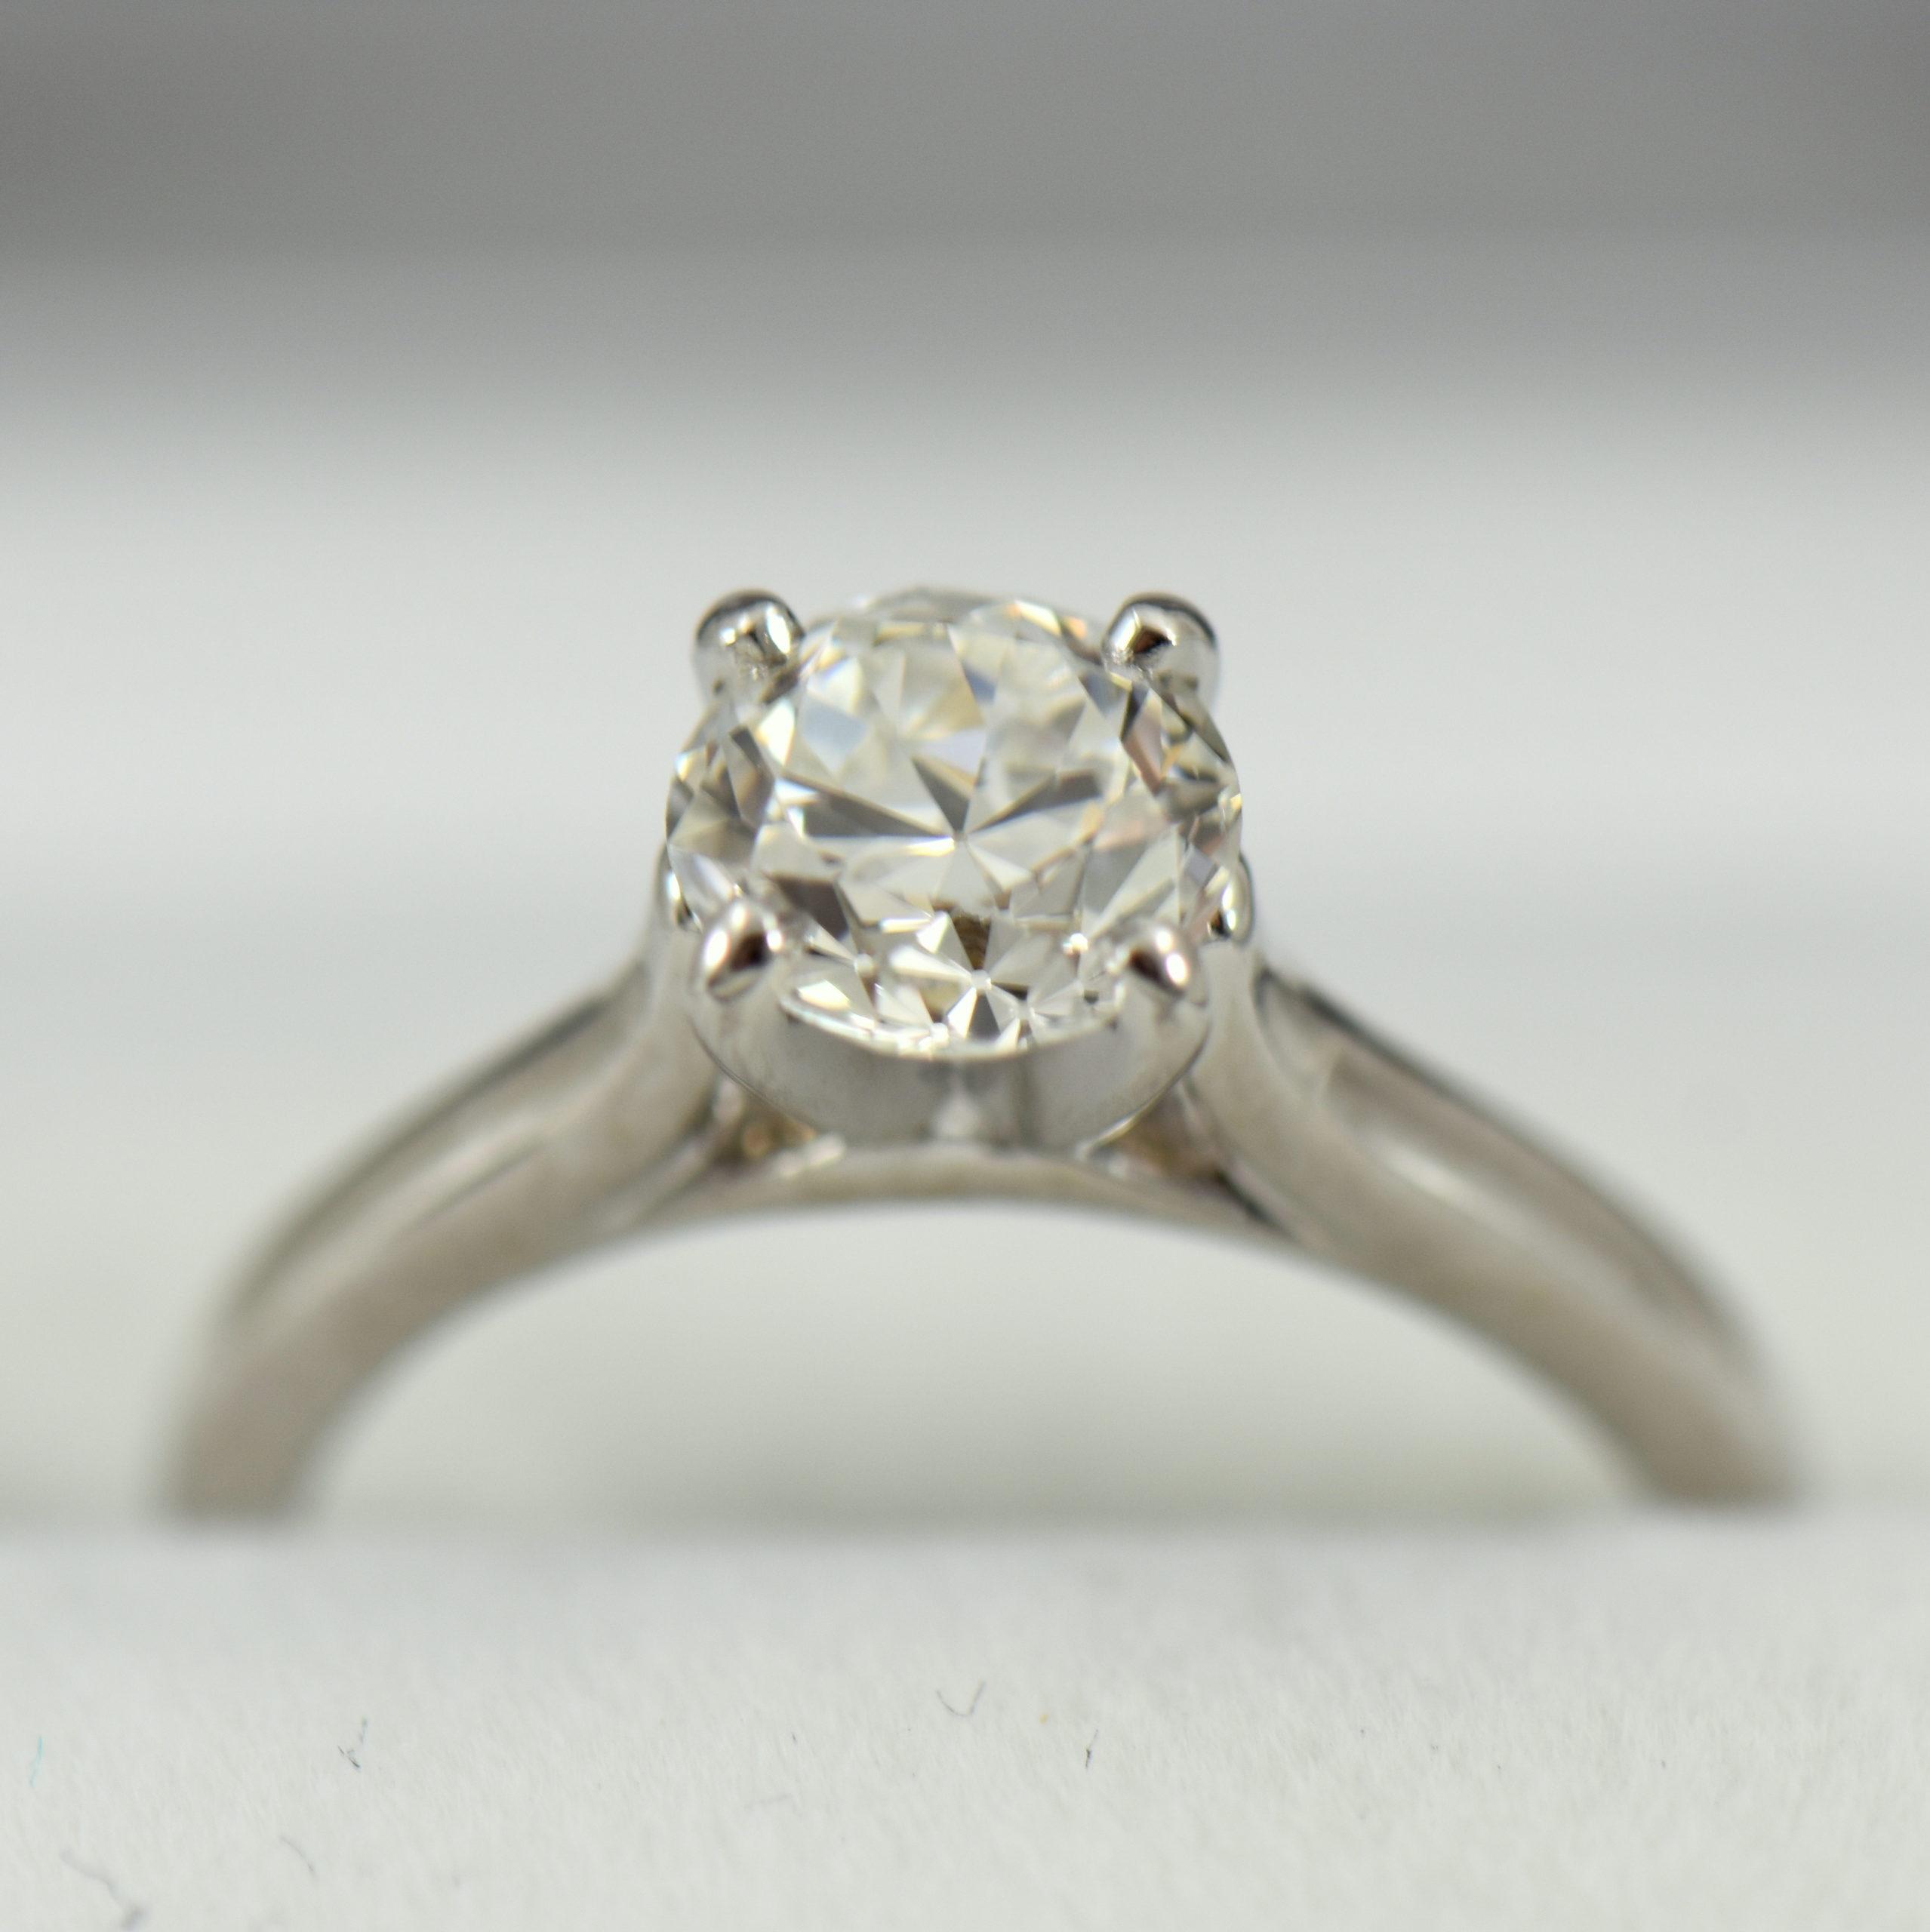 Platinum Solitaire Engagement Ring with Half Carat Modern Euro Diamond